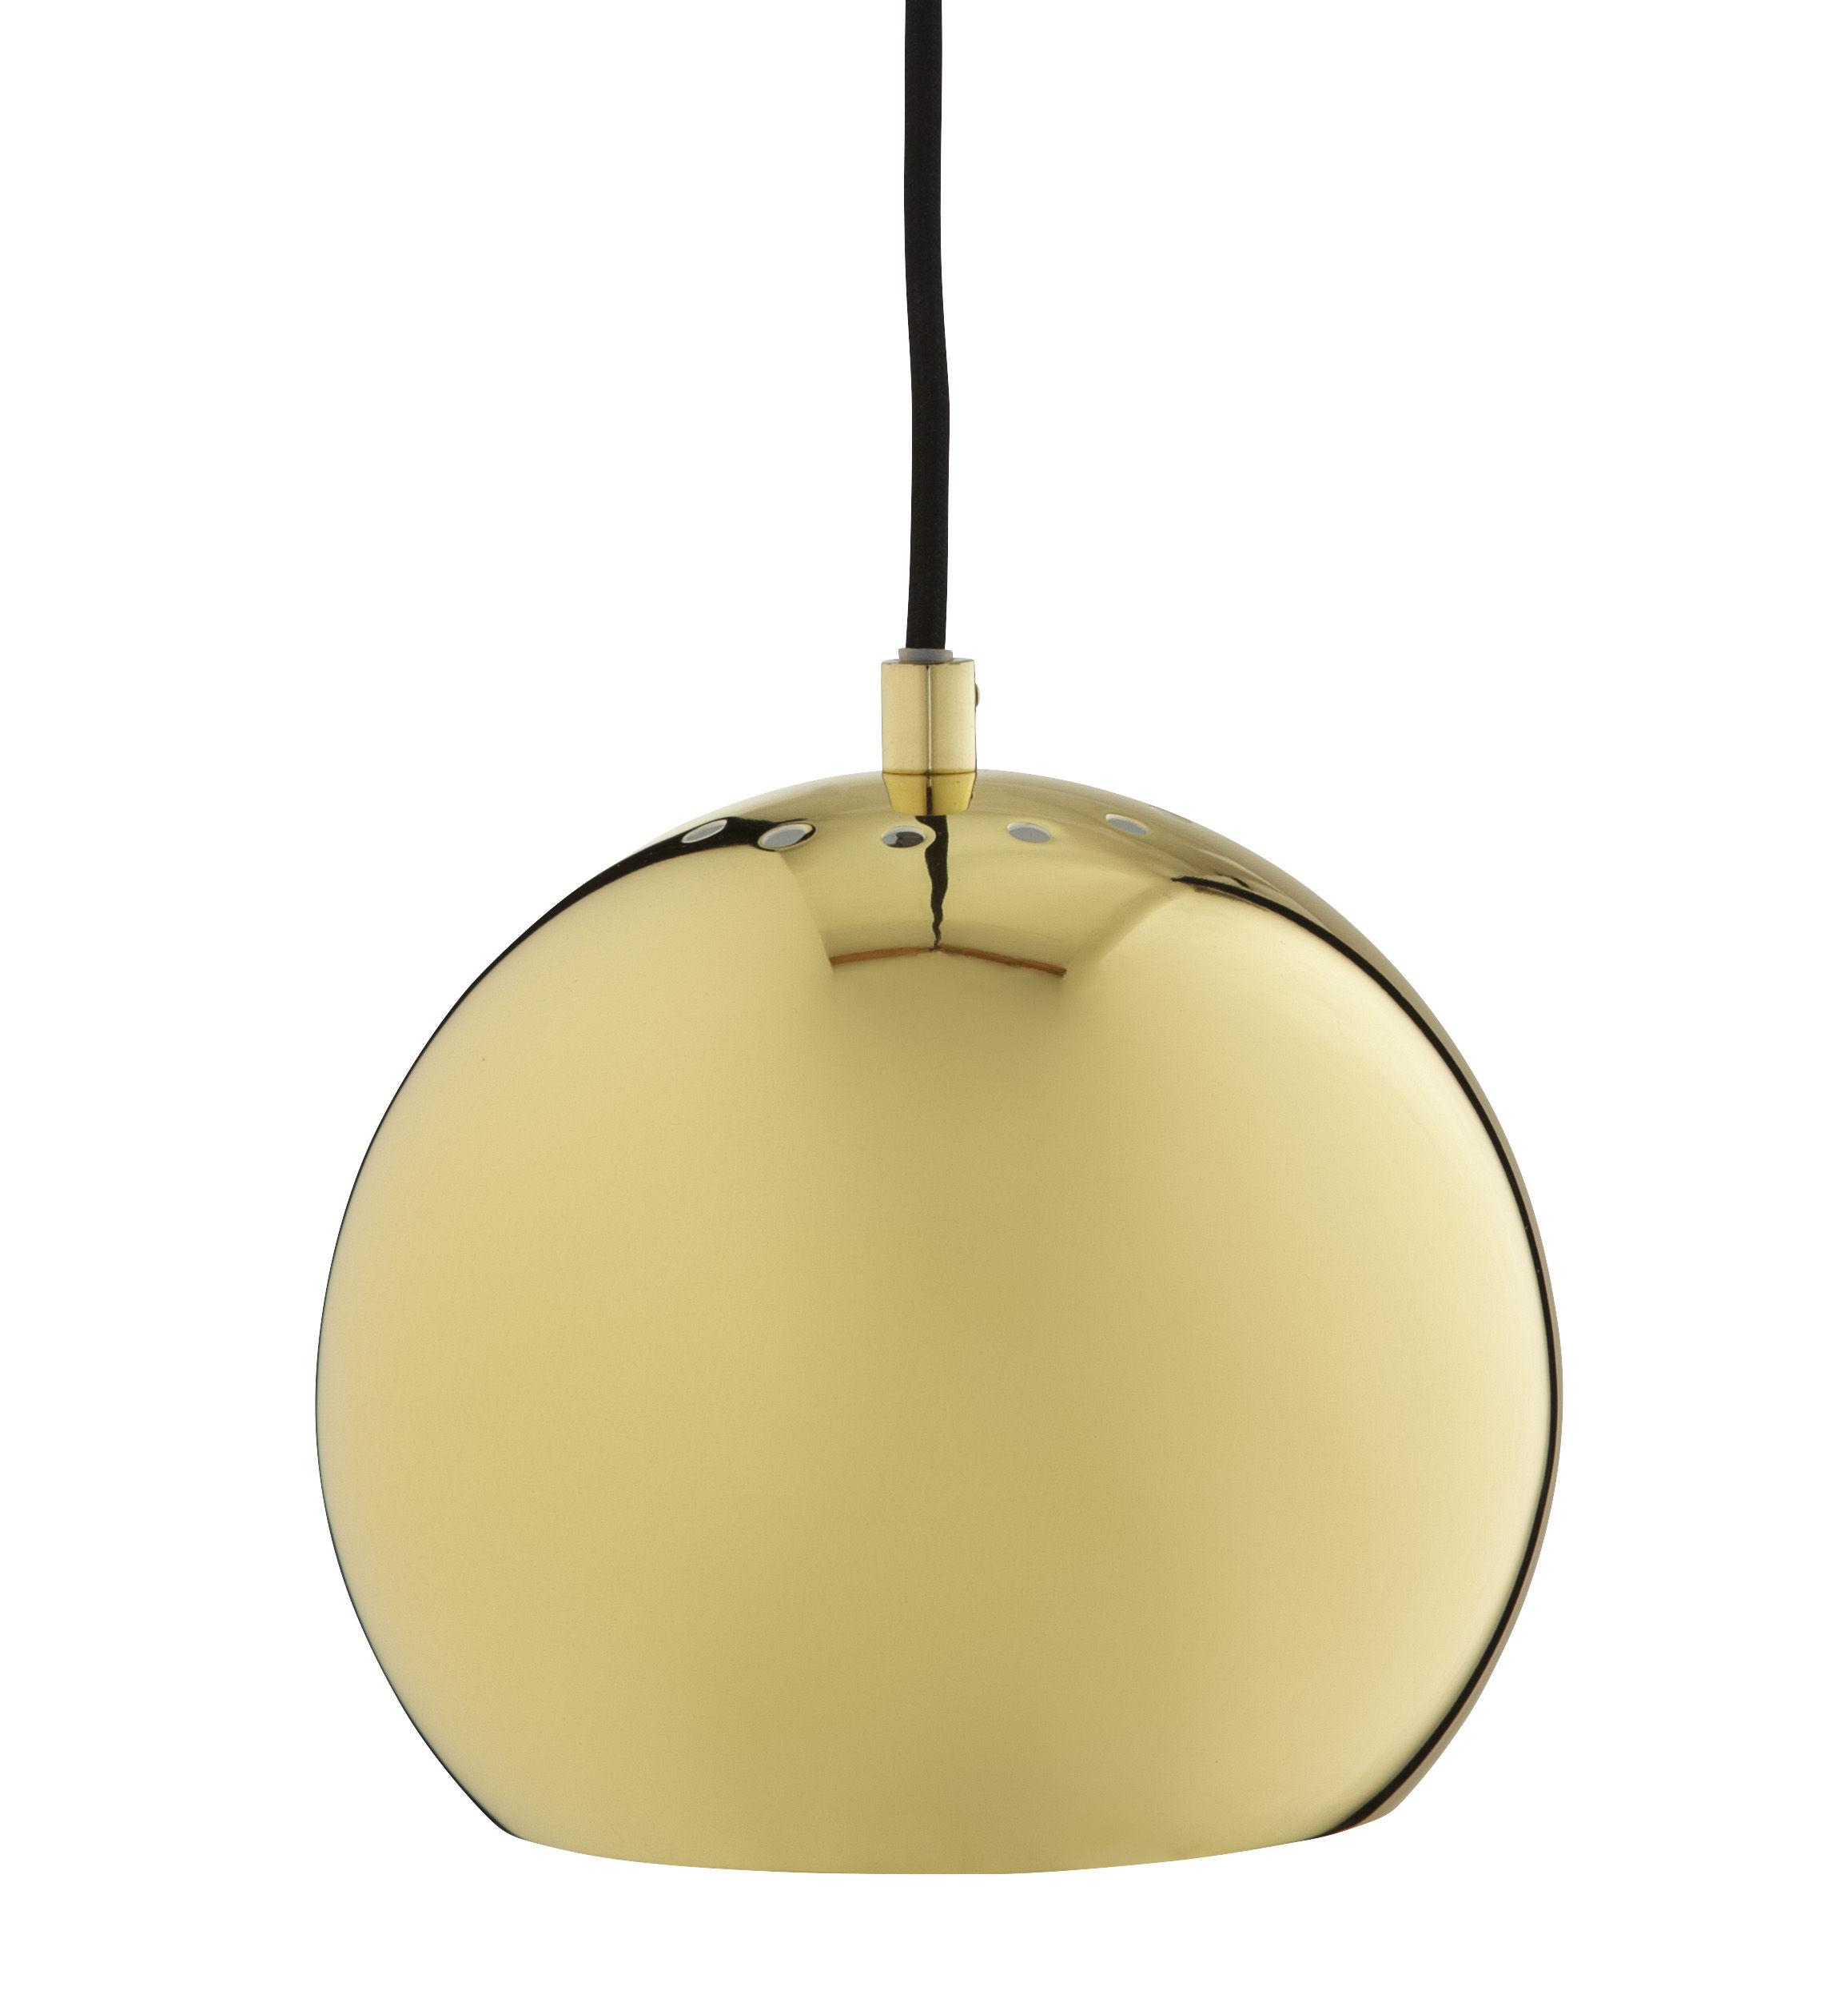 Lighting - Pendant Lighting - Ball Small Pendant by Frandsen - Brass - Brass finish metal